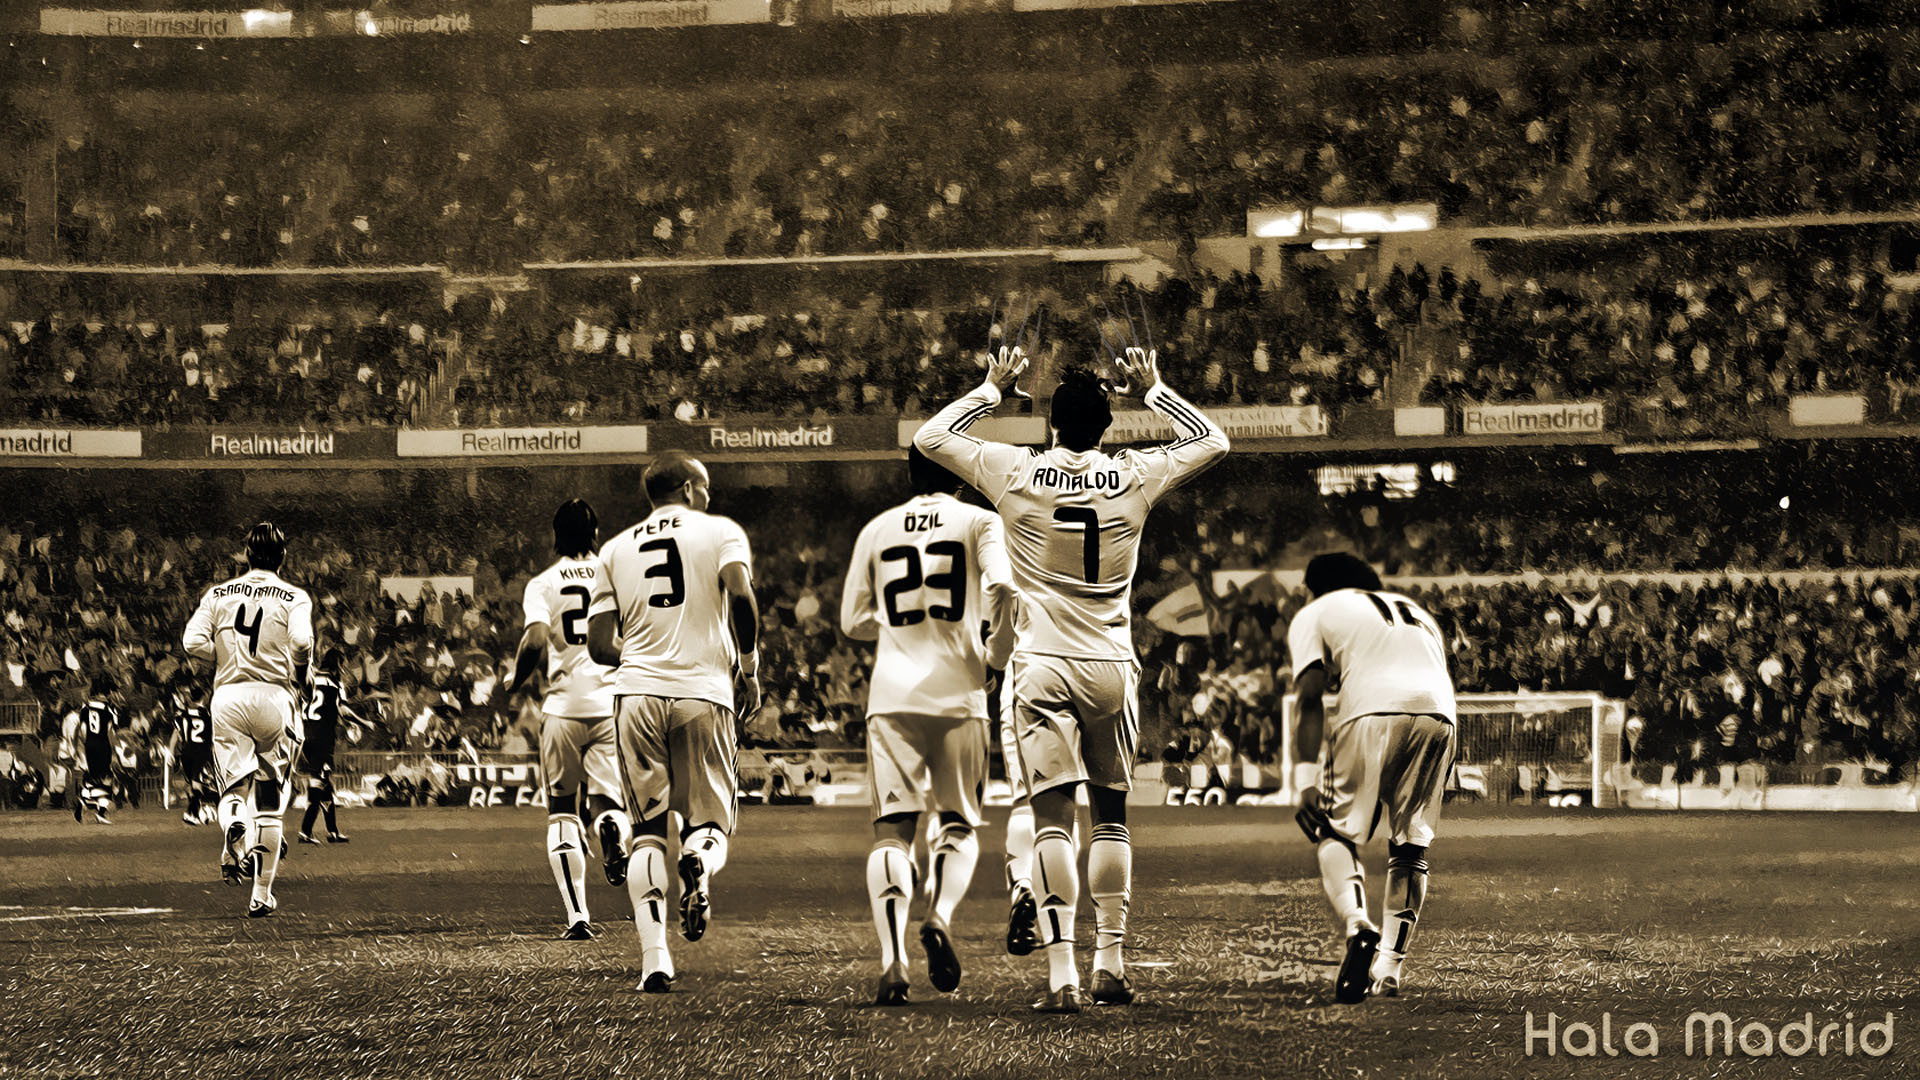 Team Real Madrid Wallpaper #7918 Wallpaper | High Definition .